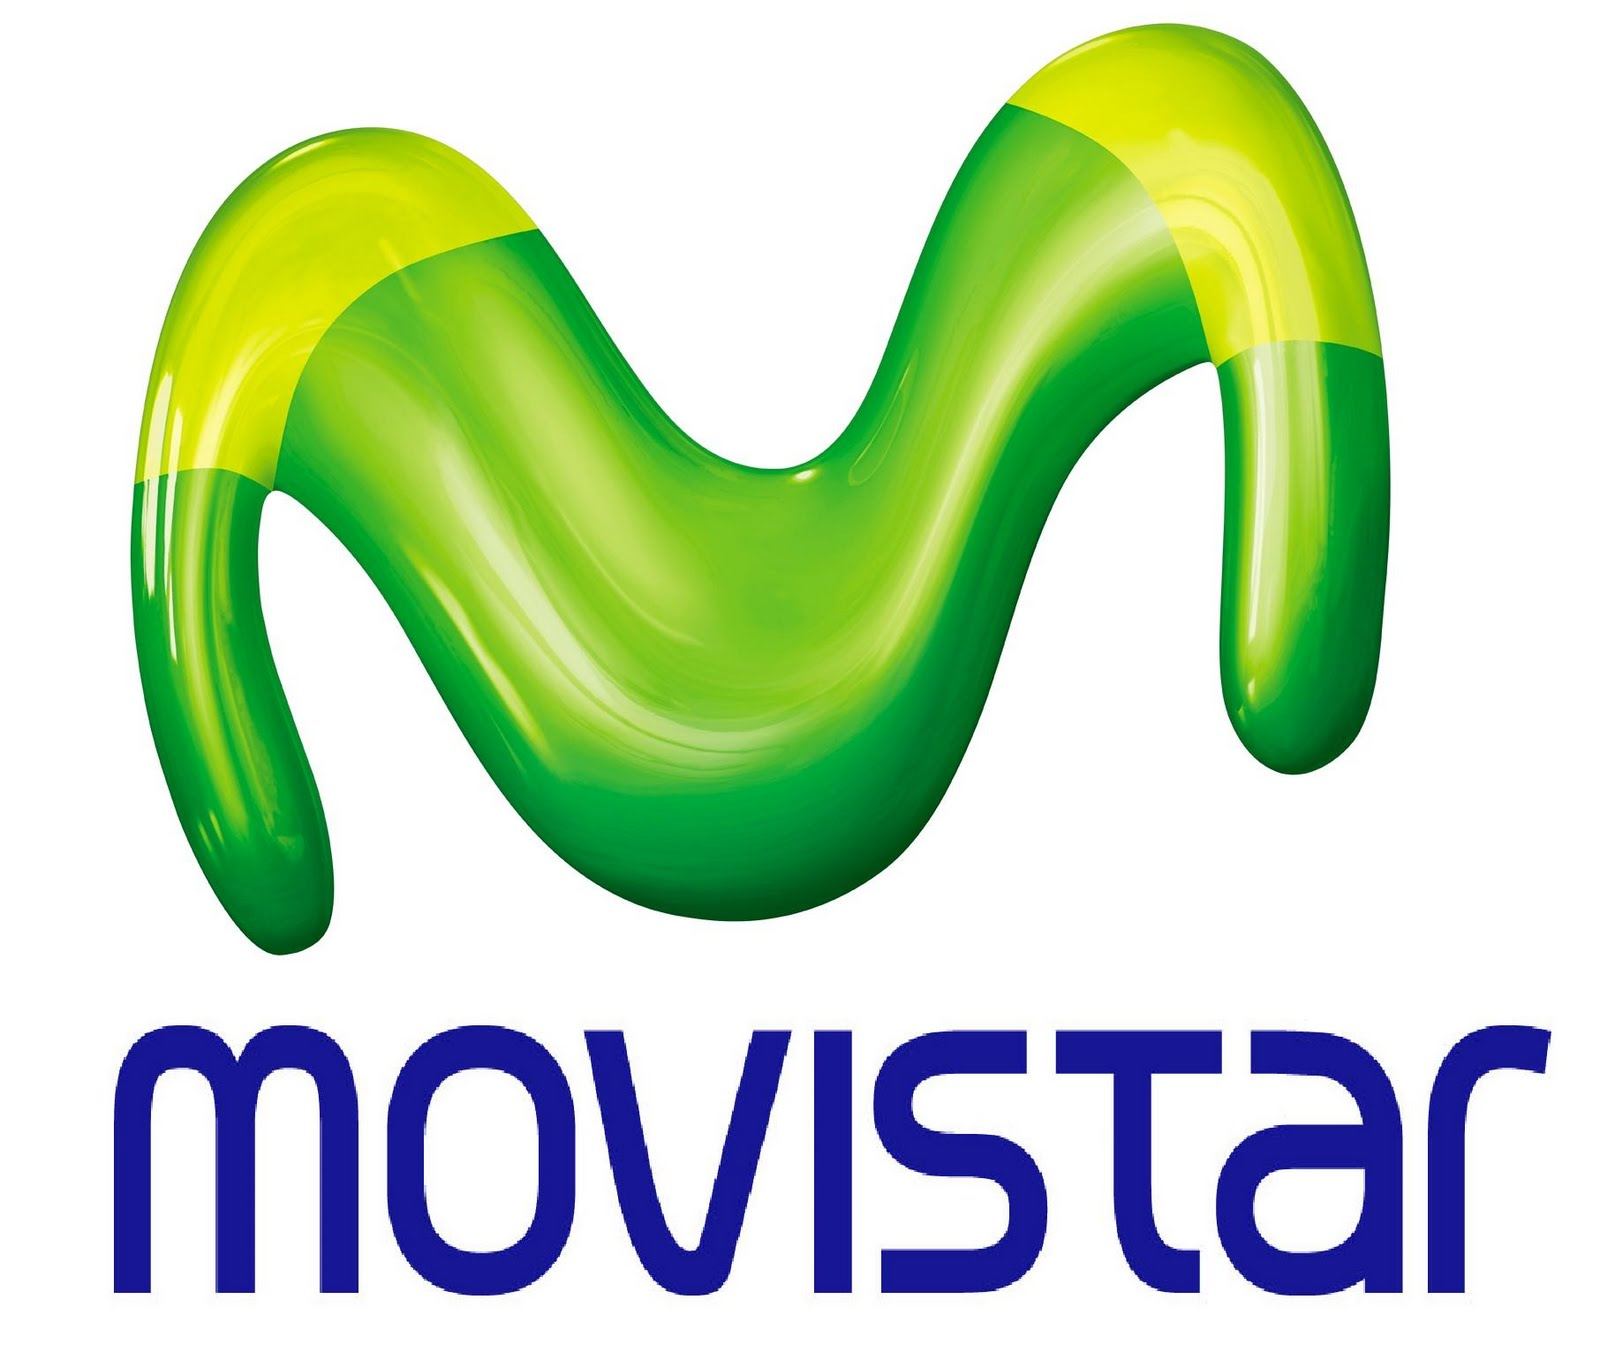 Mejor oferta convergente Internet + Fijo + Móvil Junio 2014 Movistar